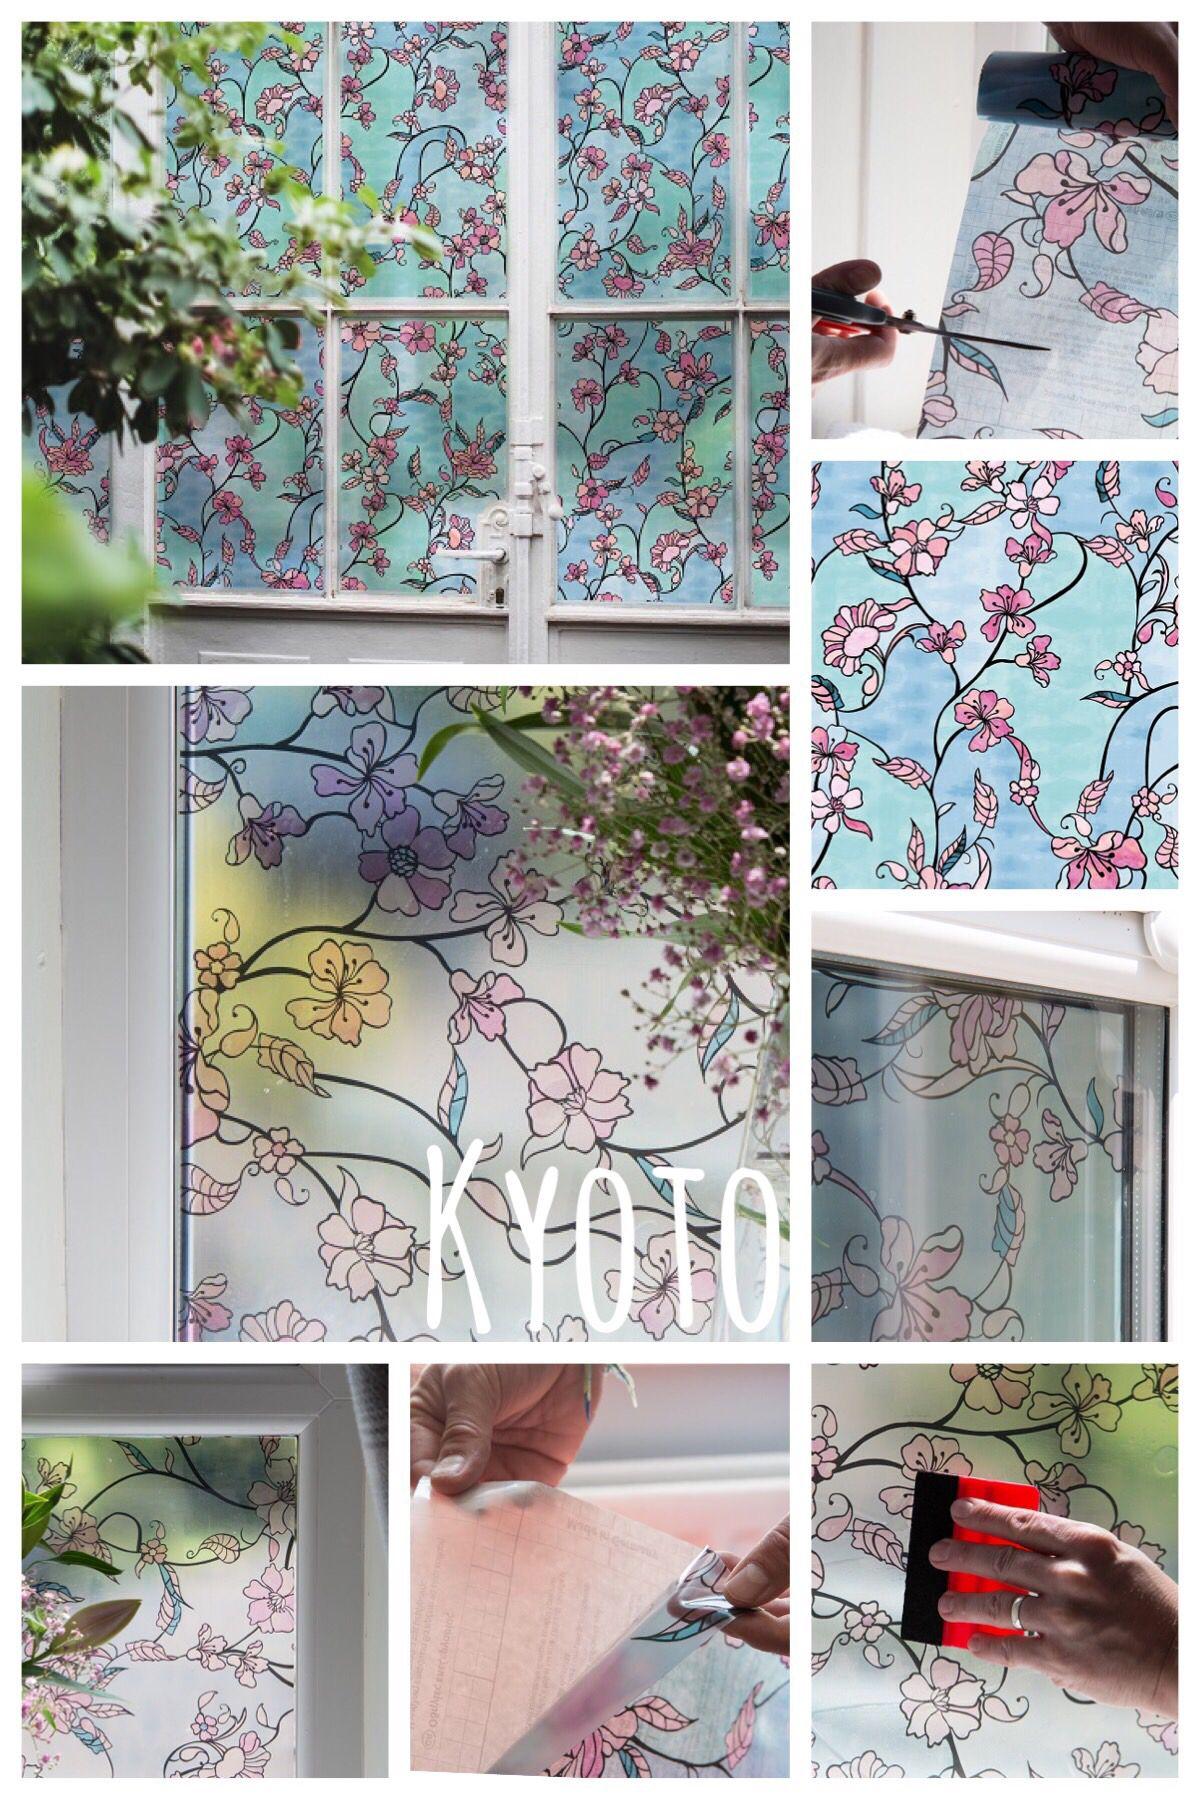 67 5cm X 1 5m D C Fix Kyoto Static Cling Vinyl Window Privacy Film 338 8141 Window Film Designs Window Film Static Cling